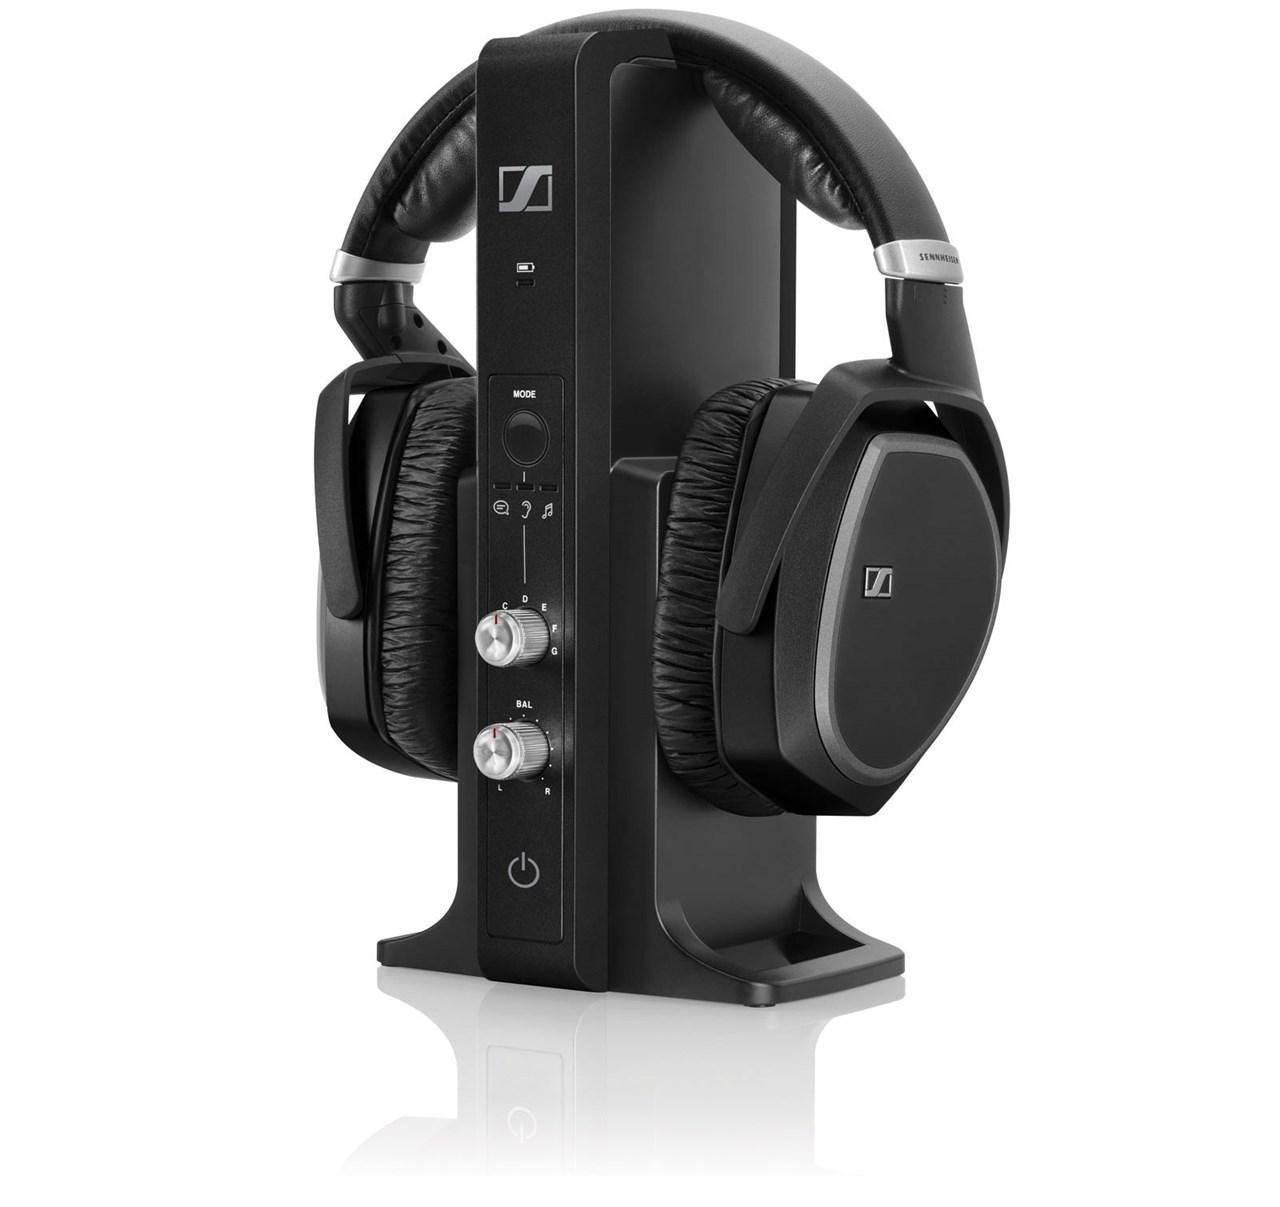 Maxiaids Sennheiser Rs 195 Tv Digital Wireless Headset